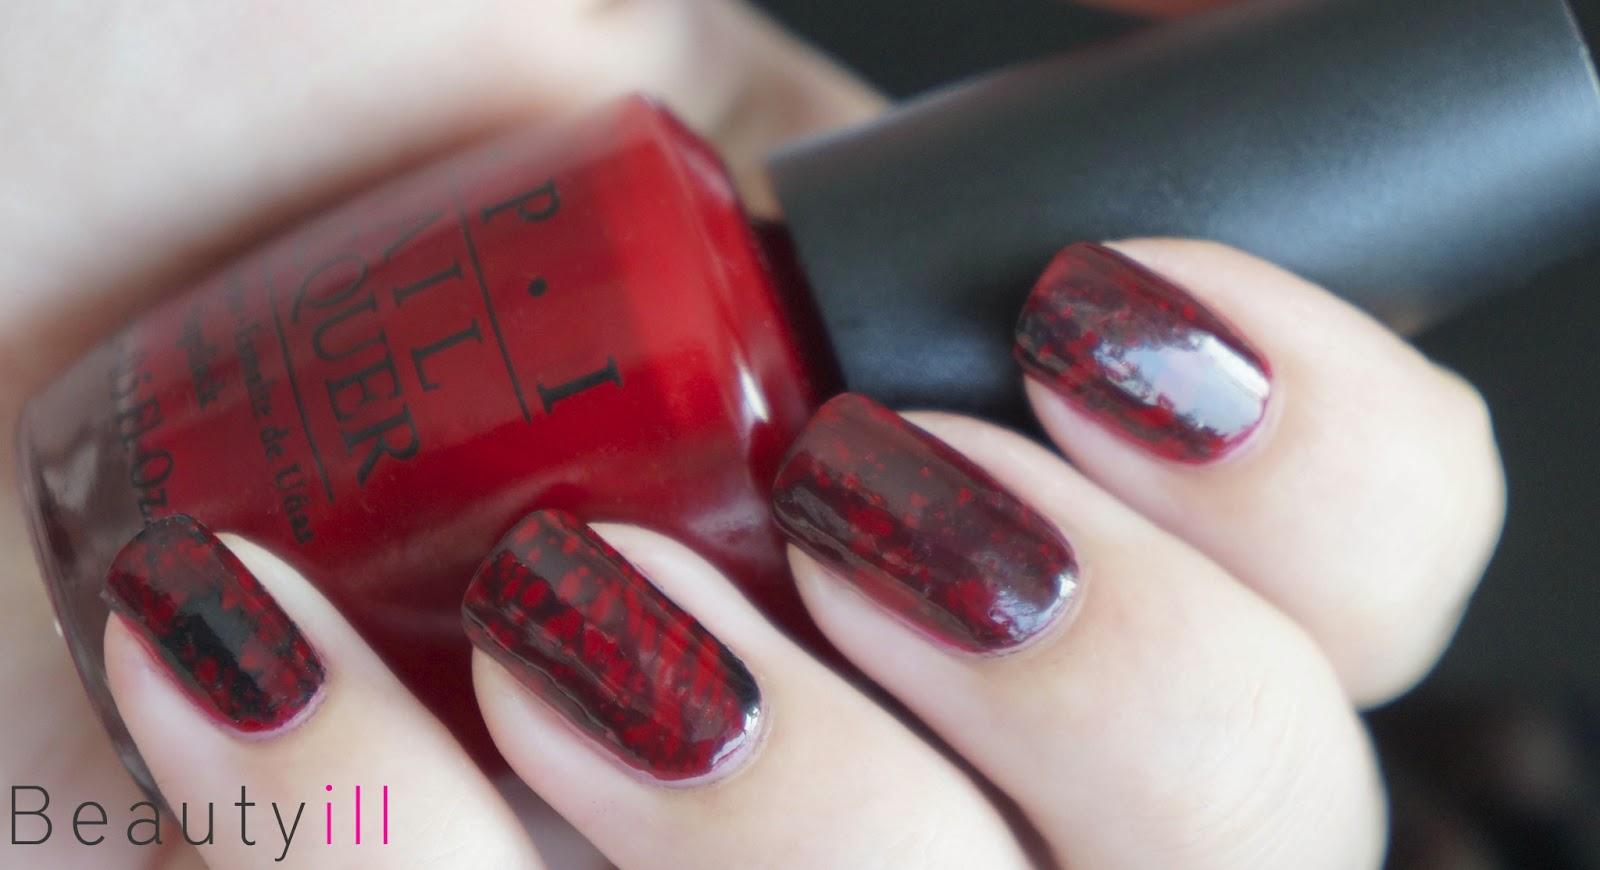 Diy Nail Art Spotted Nails Opi Inspired Beautyill